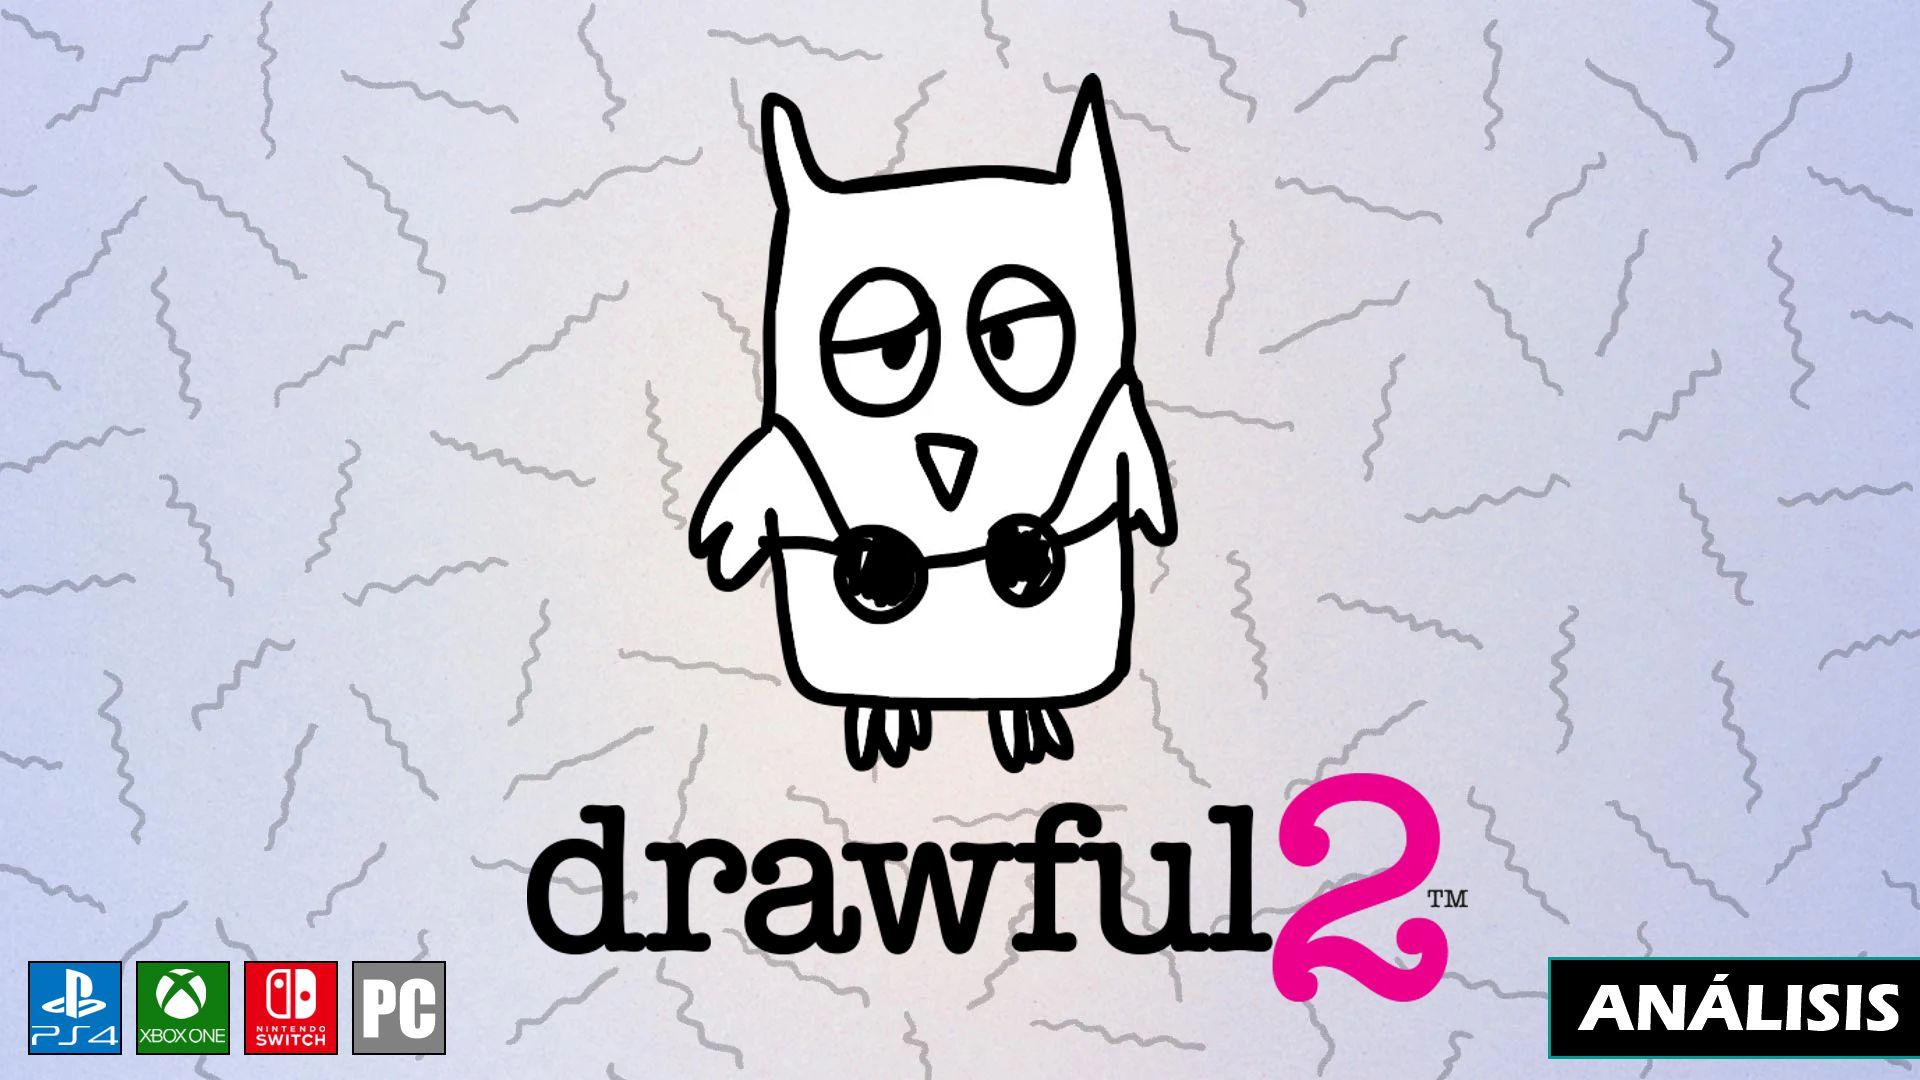 Análisis de Drawful 2 International